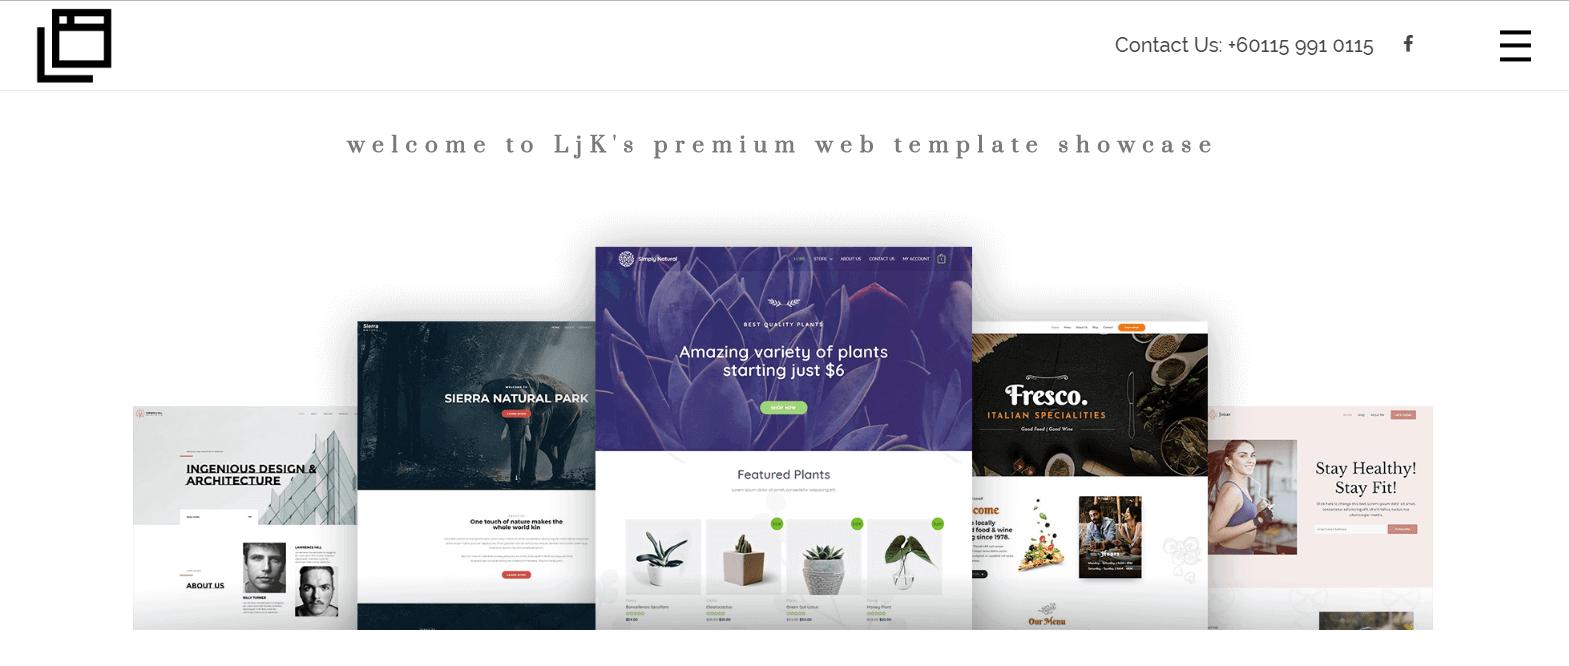 Low-Cost Premium Web Design Agency Cheras - Portfolio - LjK Digital Empire